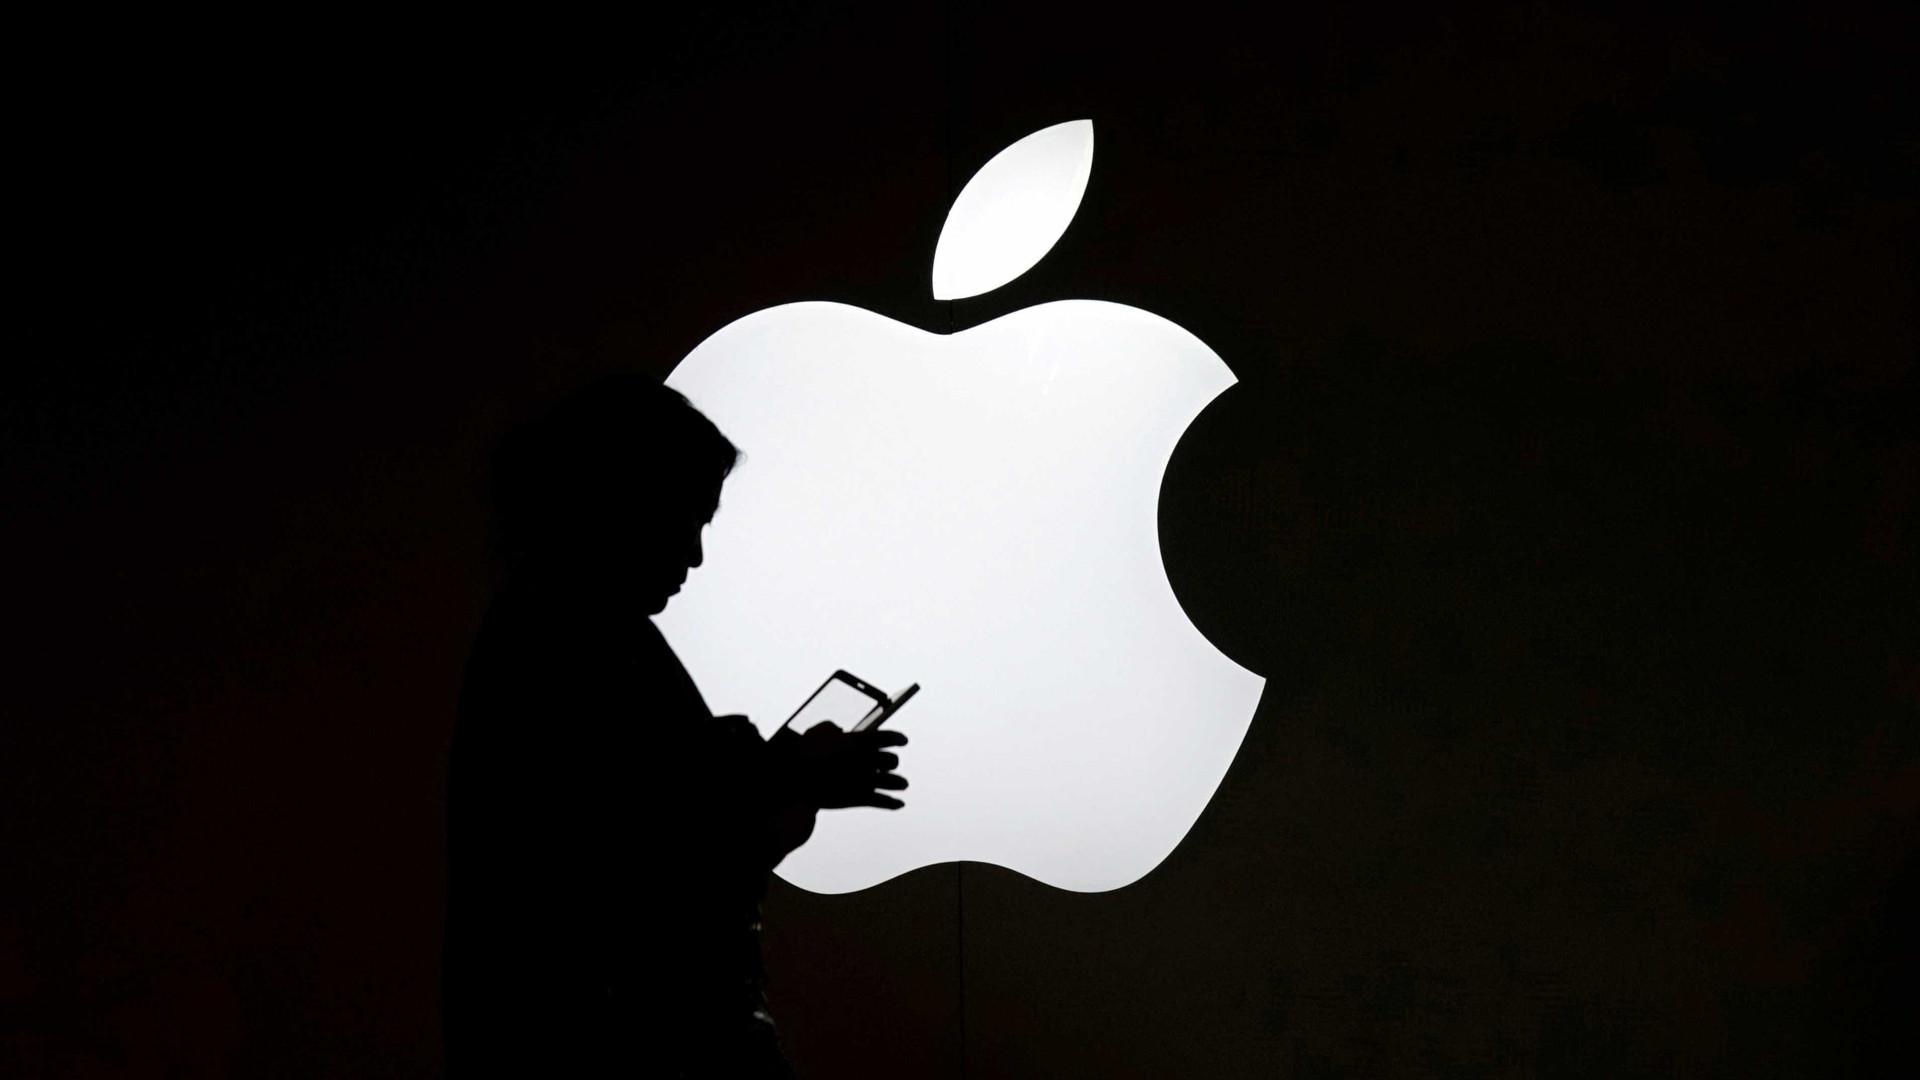 Apple confirma oficialmente evento para o dia 12 de setembro